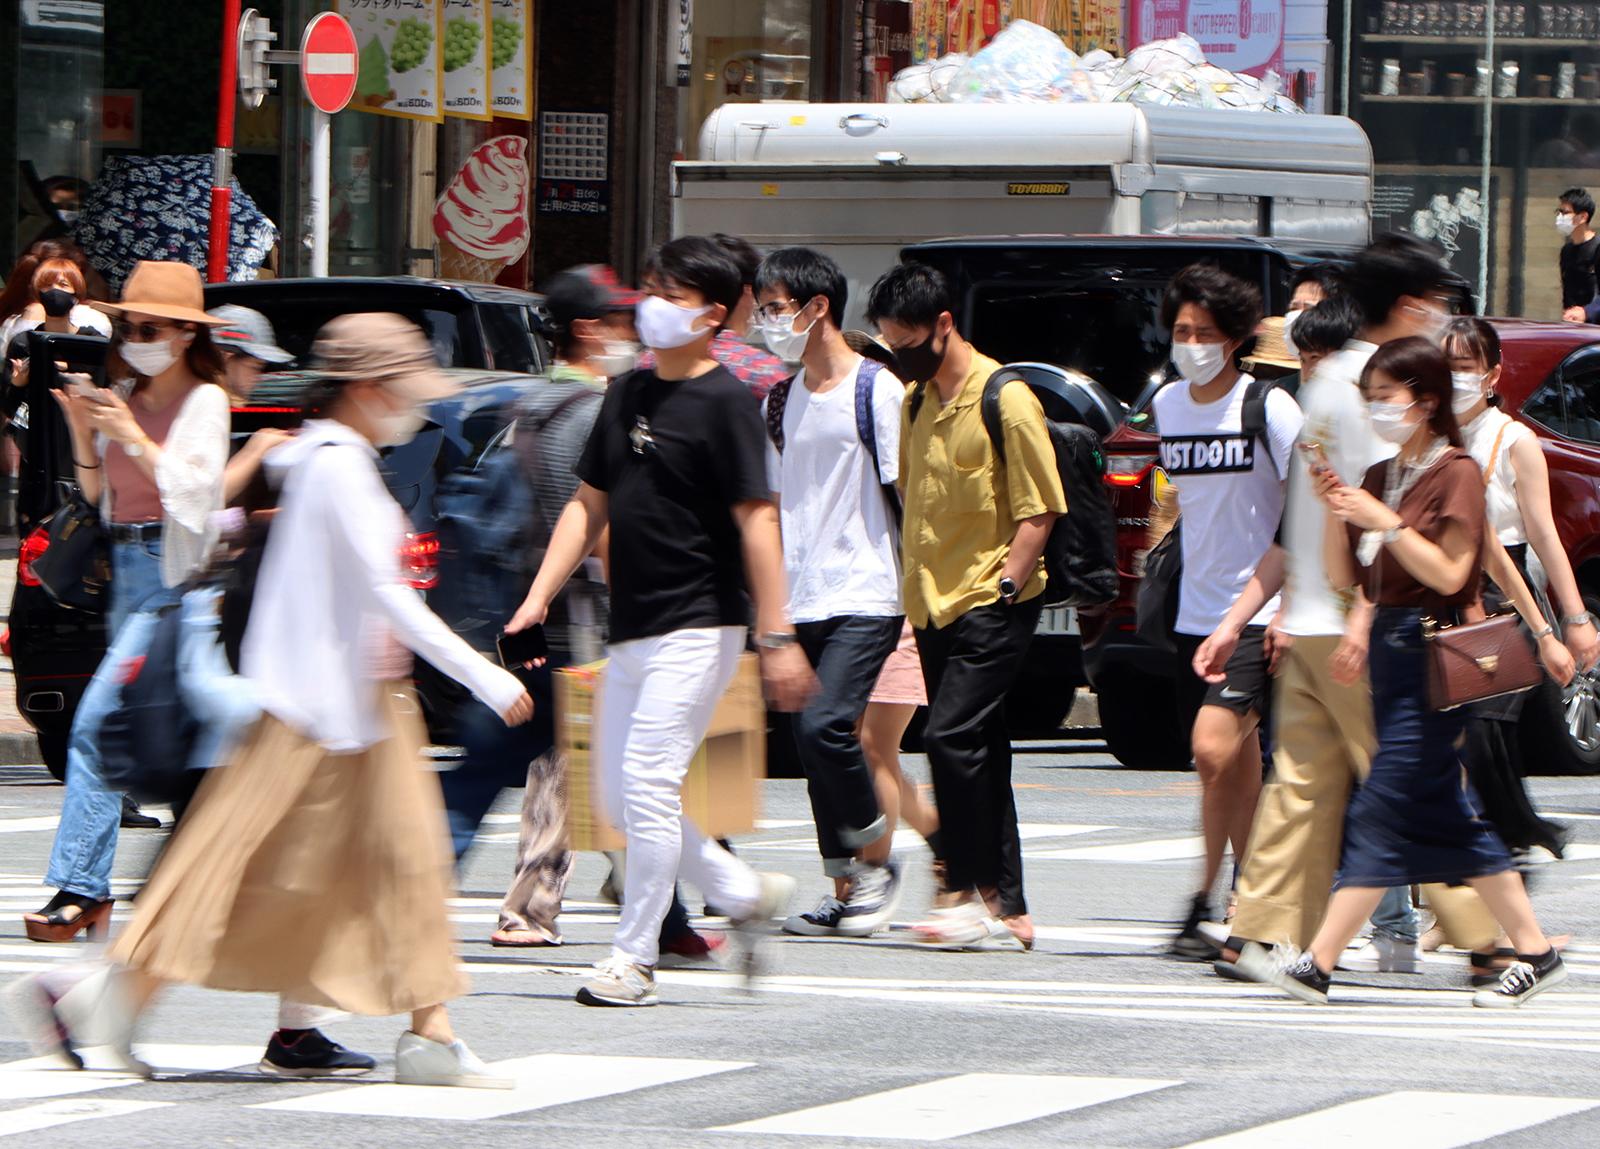 People walk on the Shibuya crossing in Tokyo on July 12.